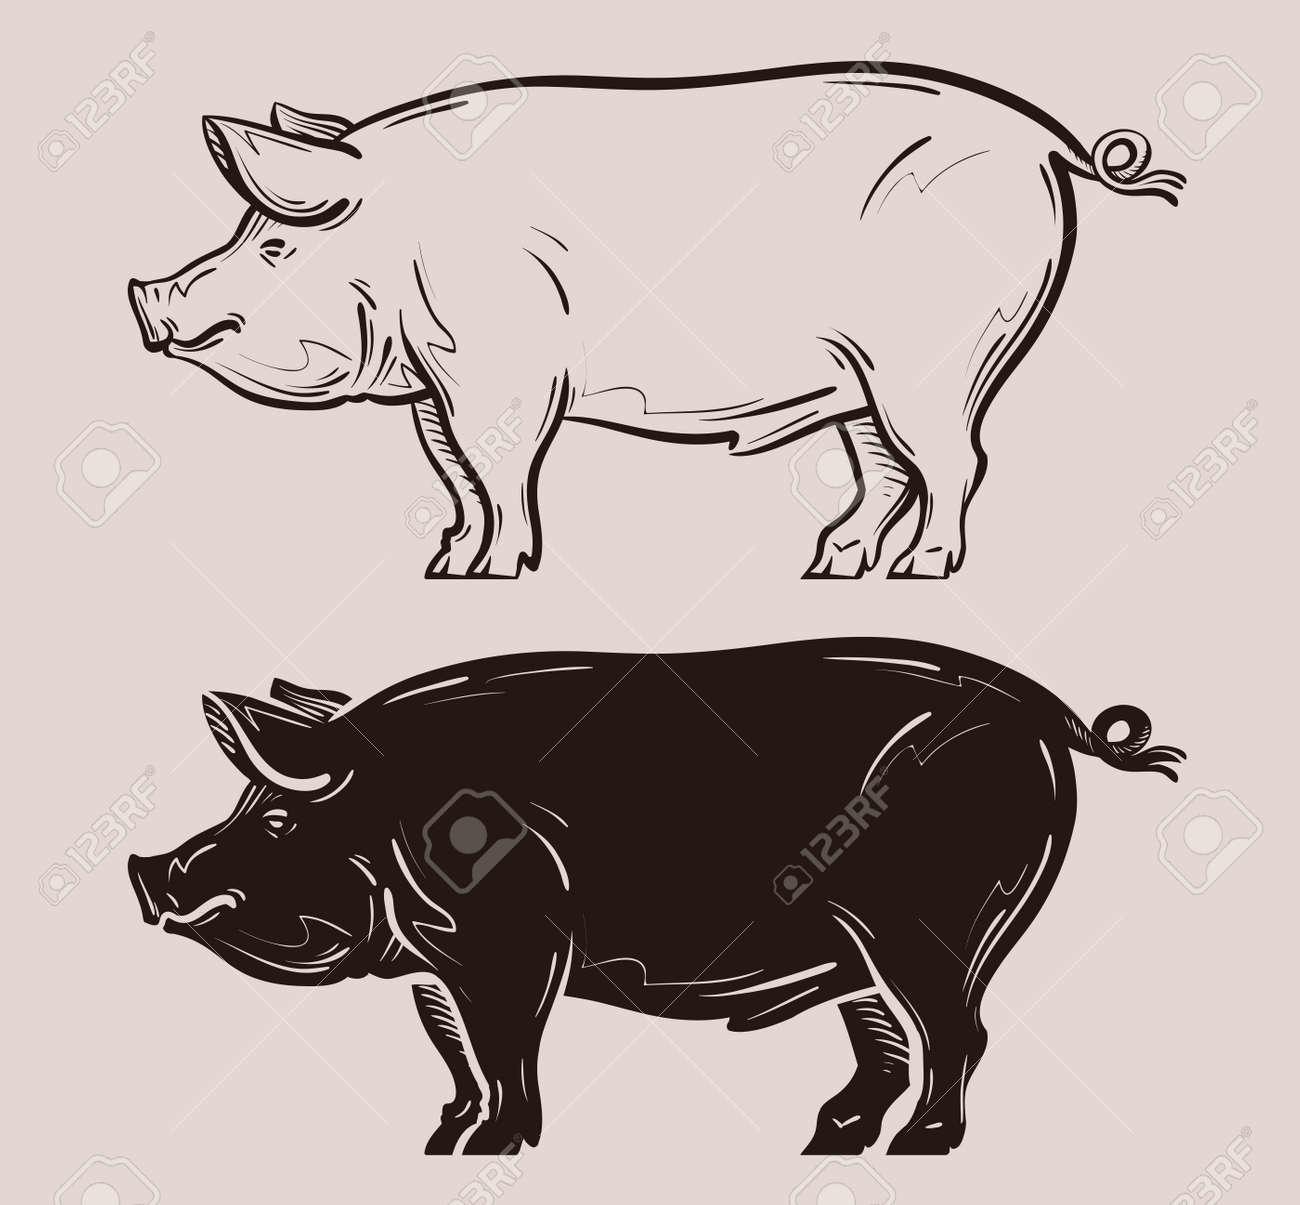 pig vector. farm, pork or piggy icon - 56433311